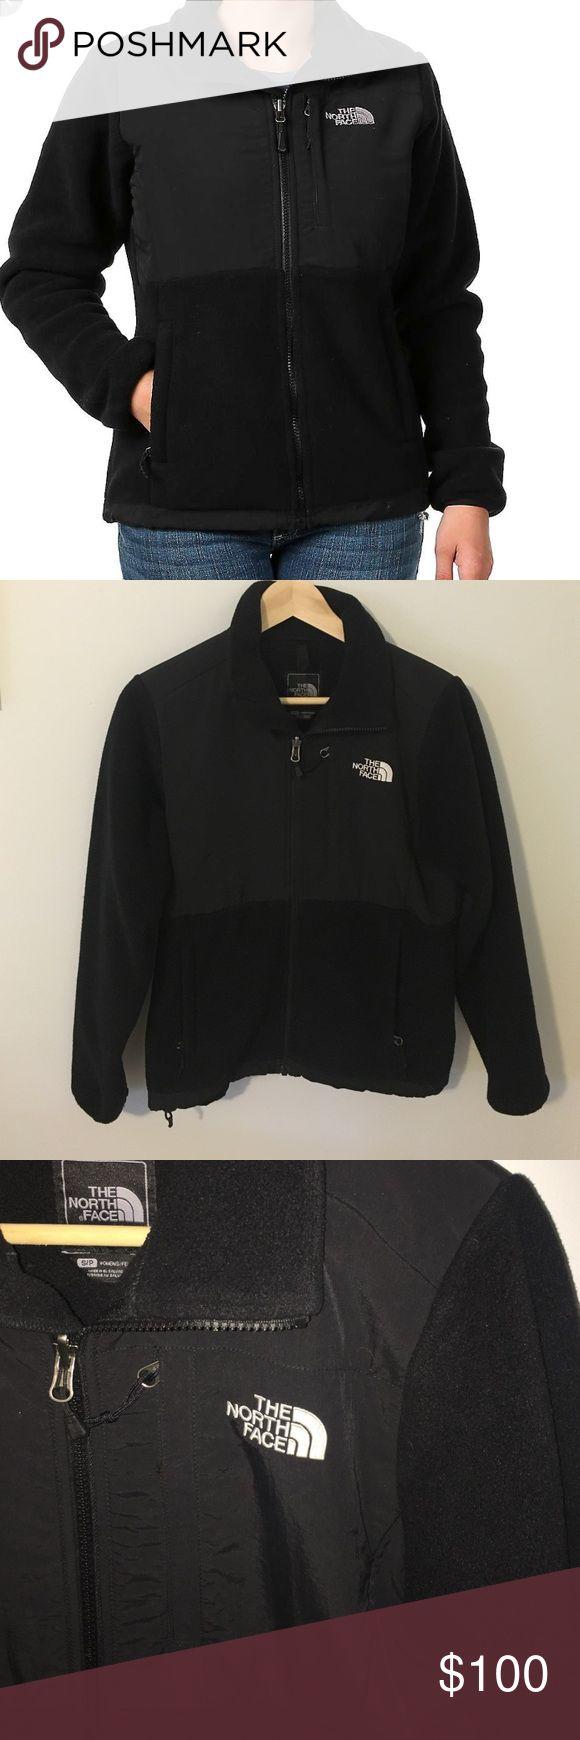 Black Northface Denali Fleece Jacket Great condition, authentic north face! The North Face Jackets & Coats